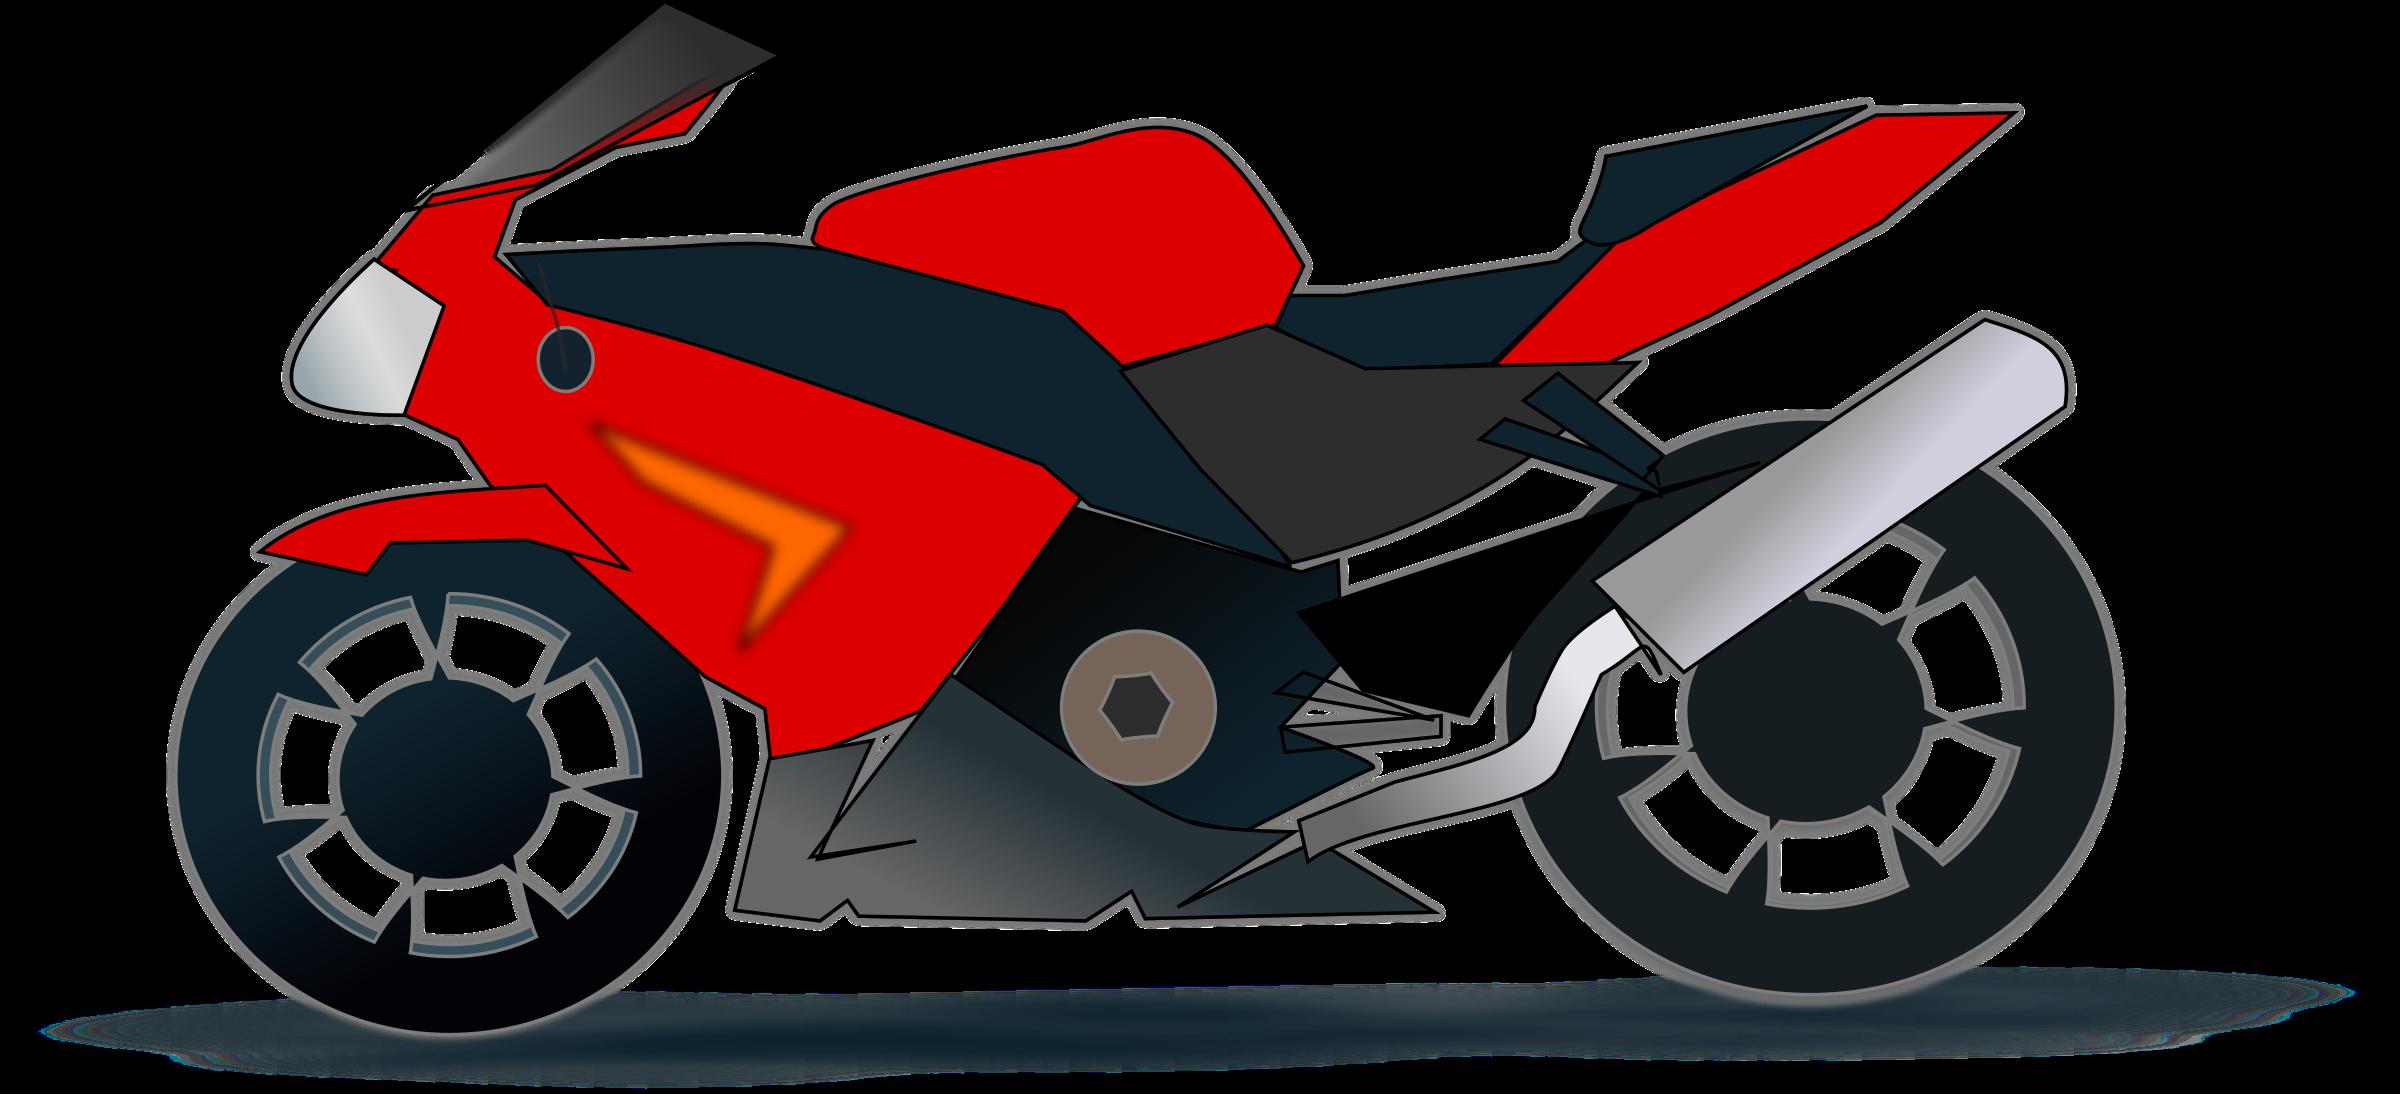 Race clipart motor bike. Big image png